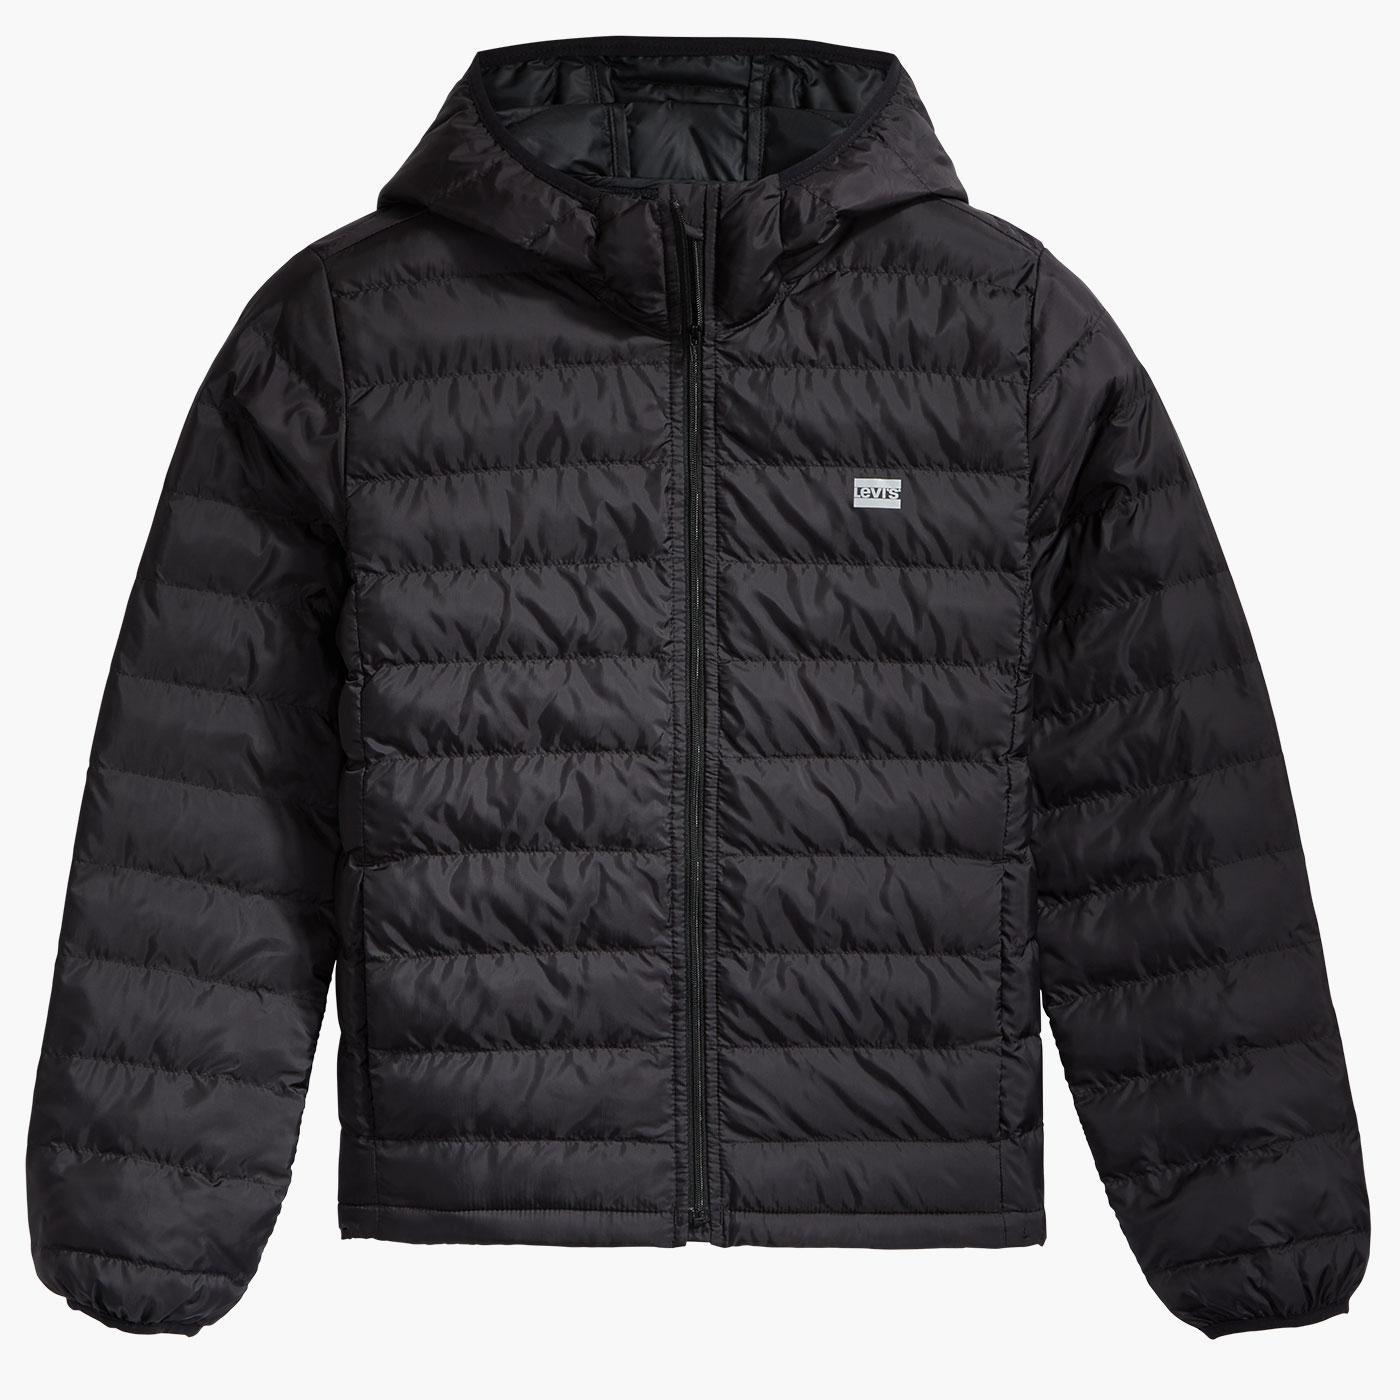 Pandora LEVI'S WOMENS Retro Packable Puffer Jacket